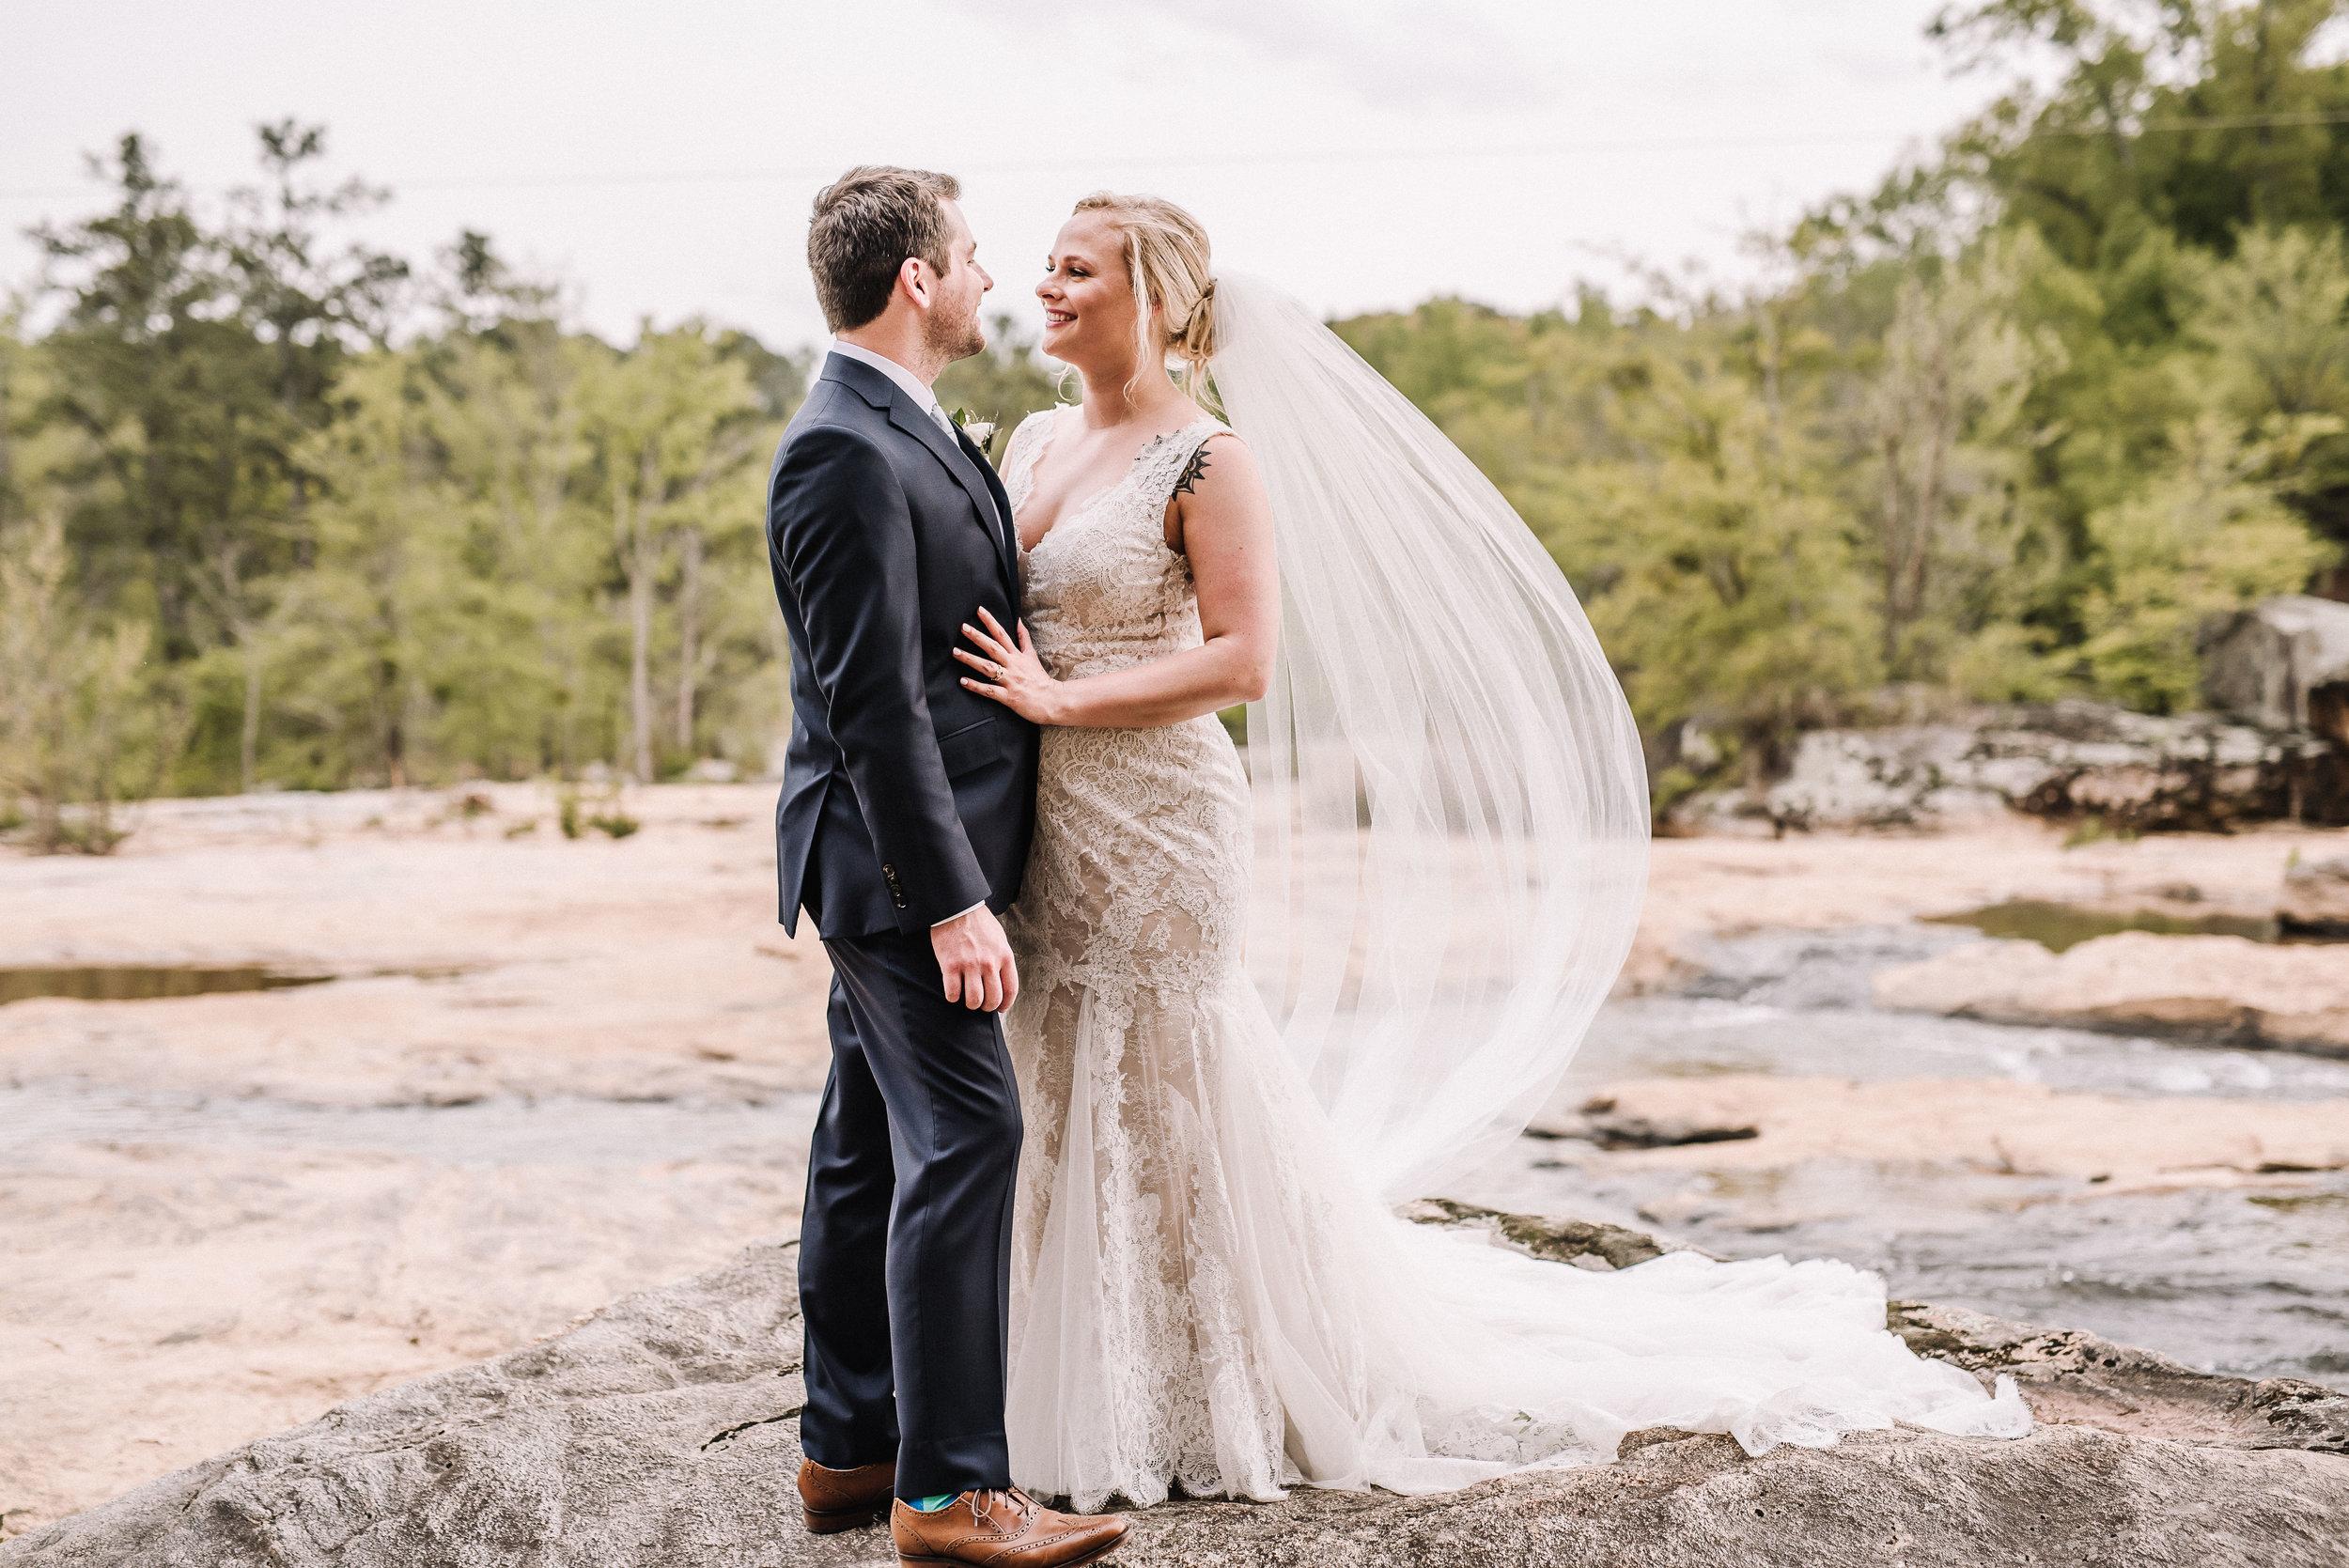 Morgan Wedding_Mill at Yellow River_Ashley Benham Photography-867.jpg